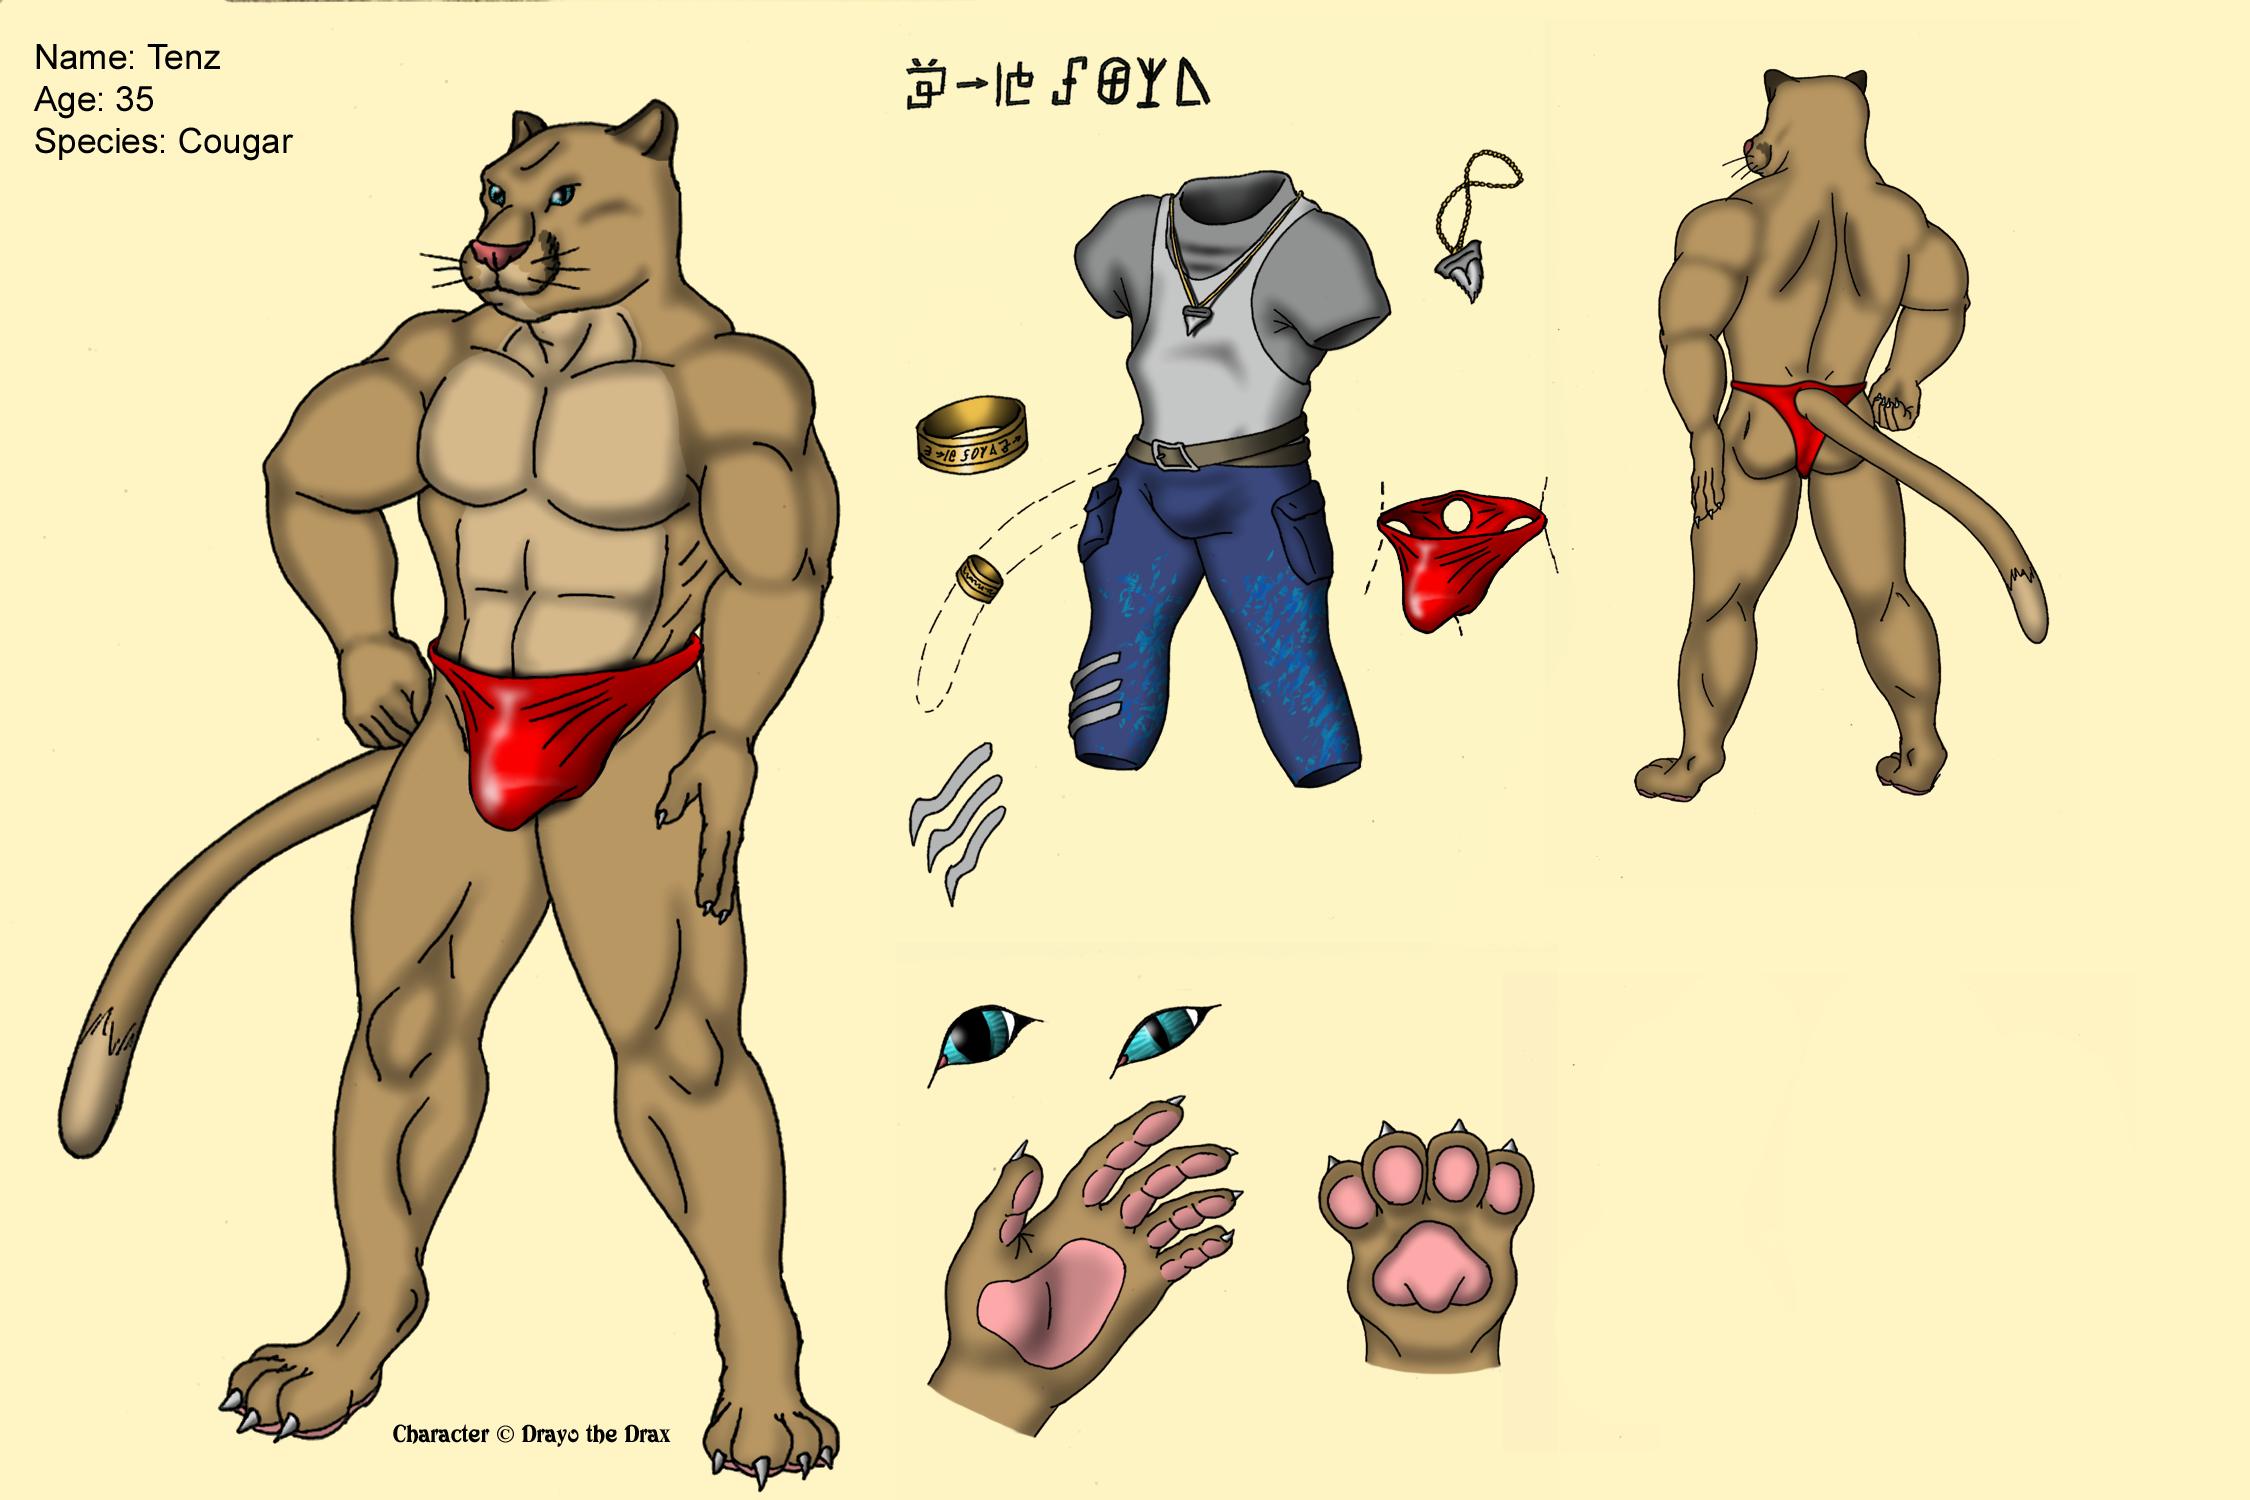 Character Sheet - Tenz